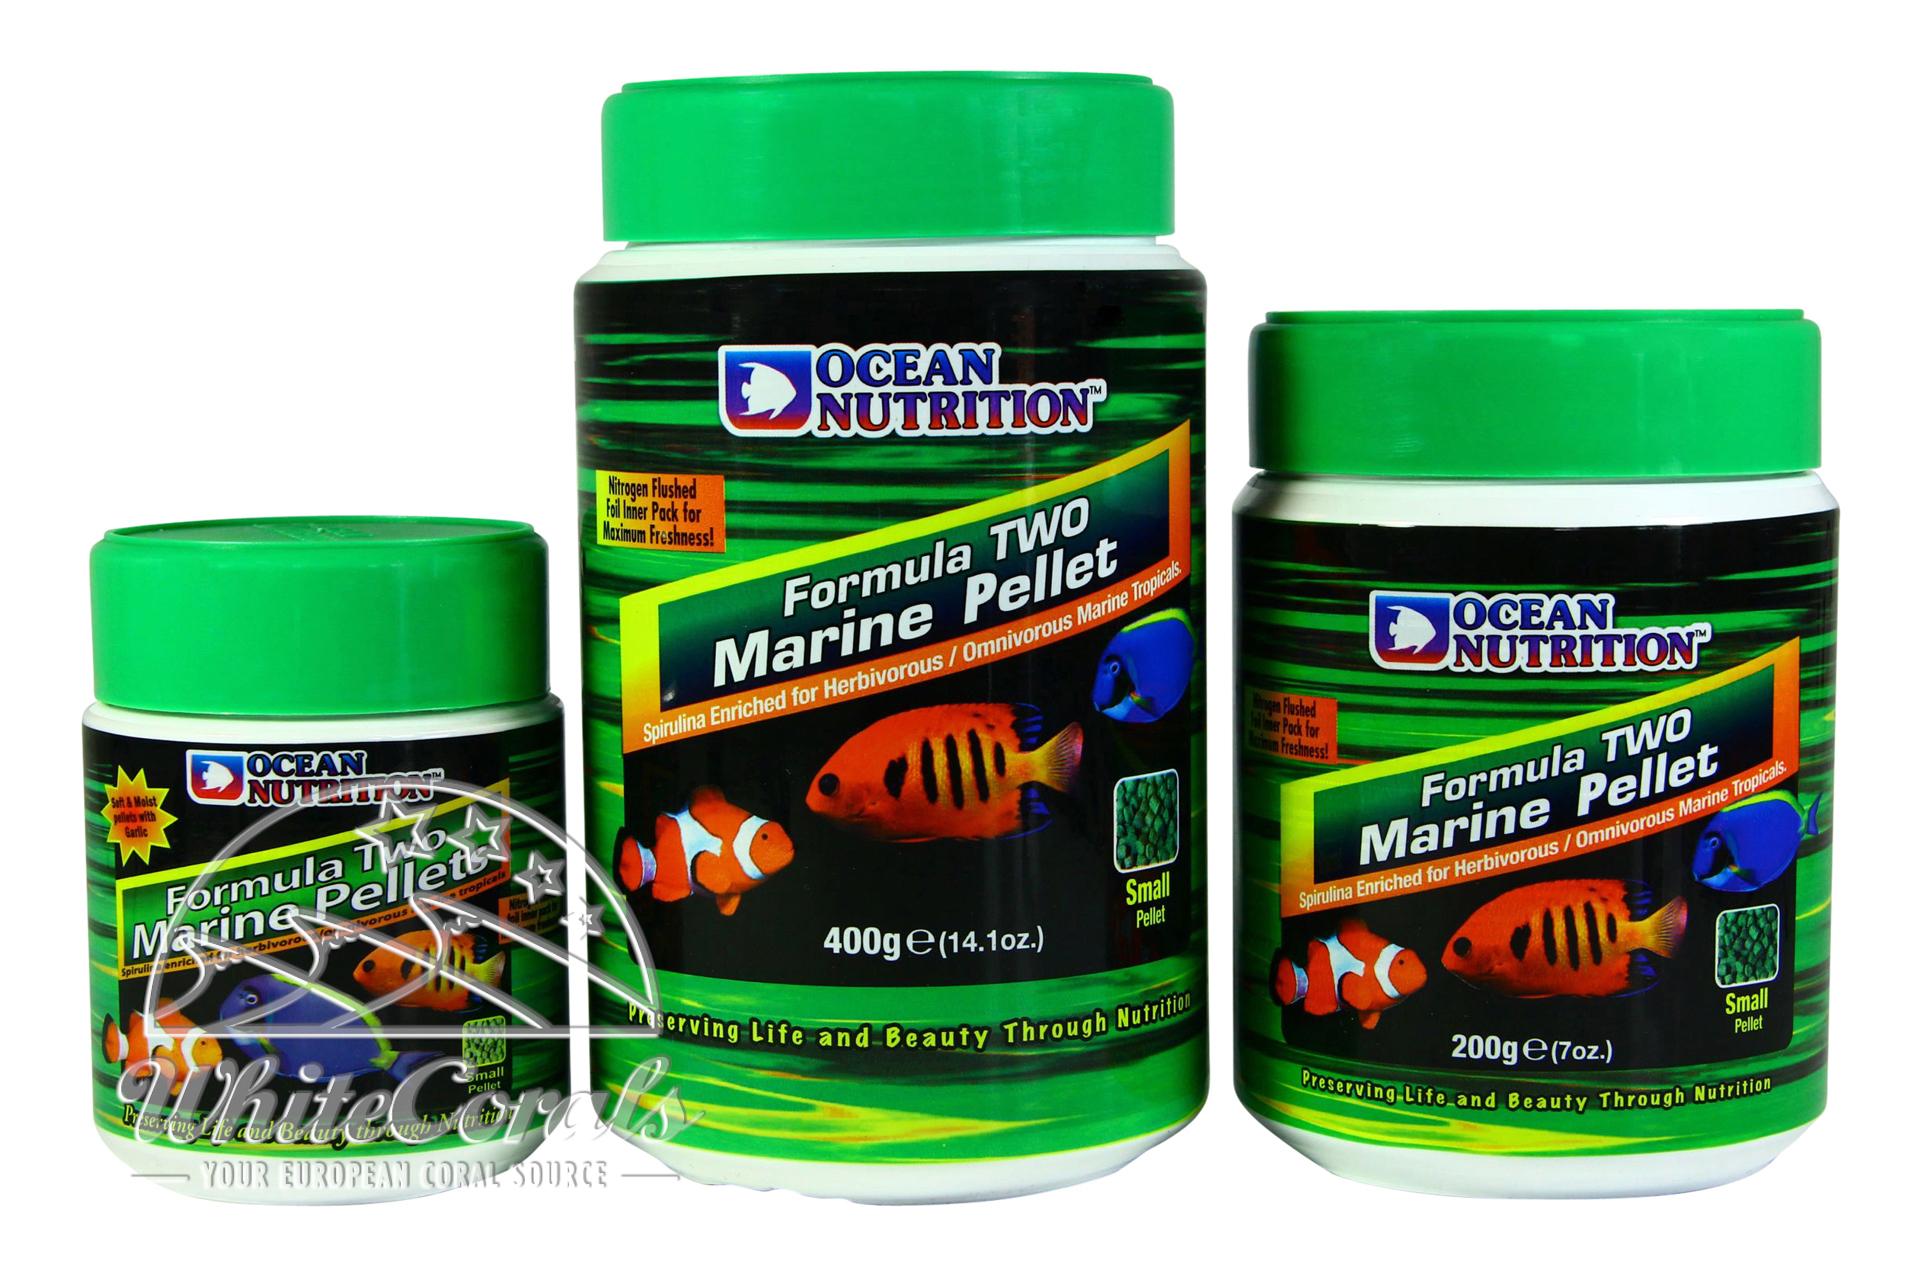 Ocean Nutrition Formula Two Marine Soft-Pellet Small